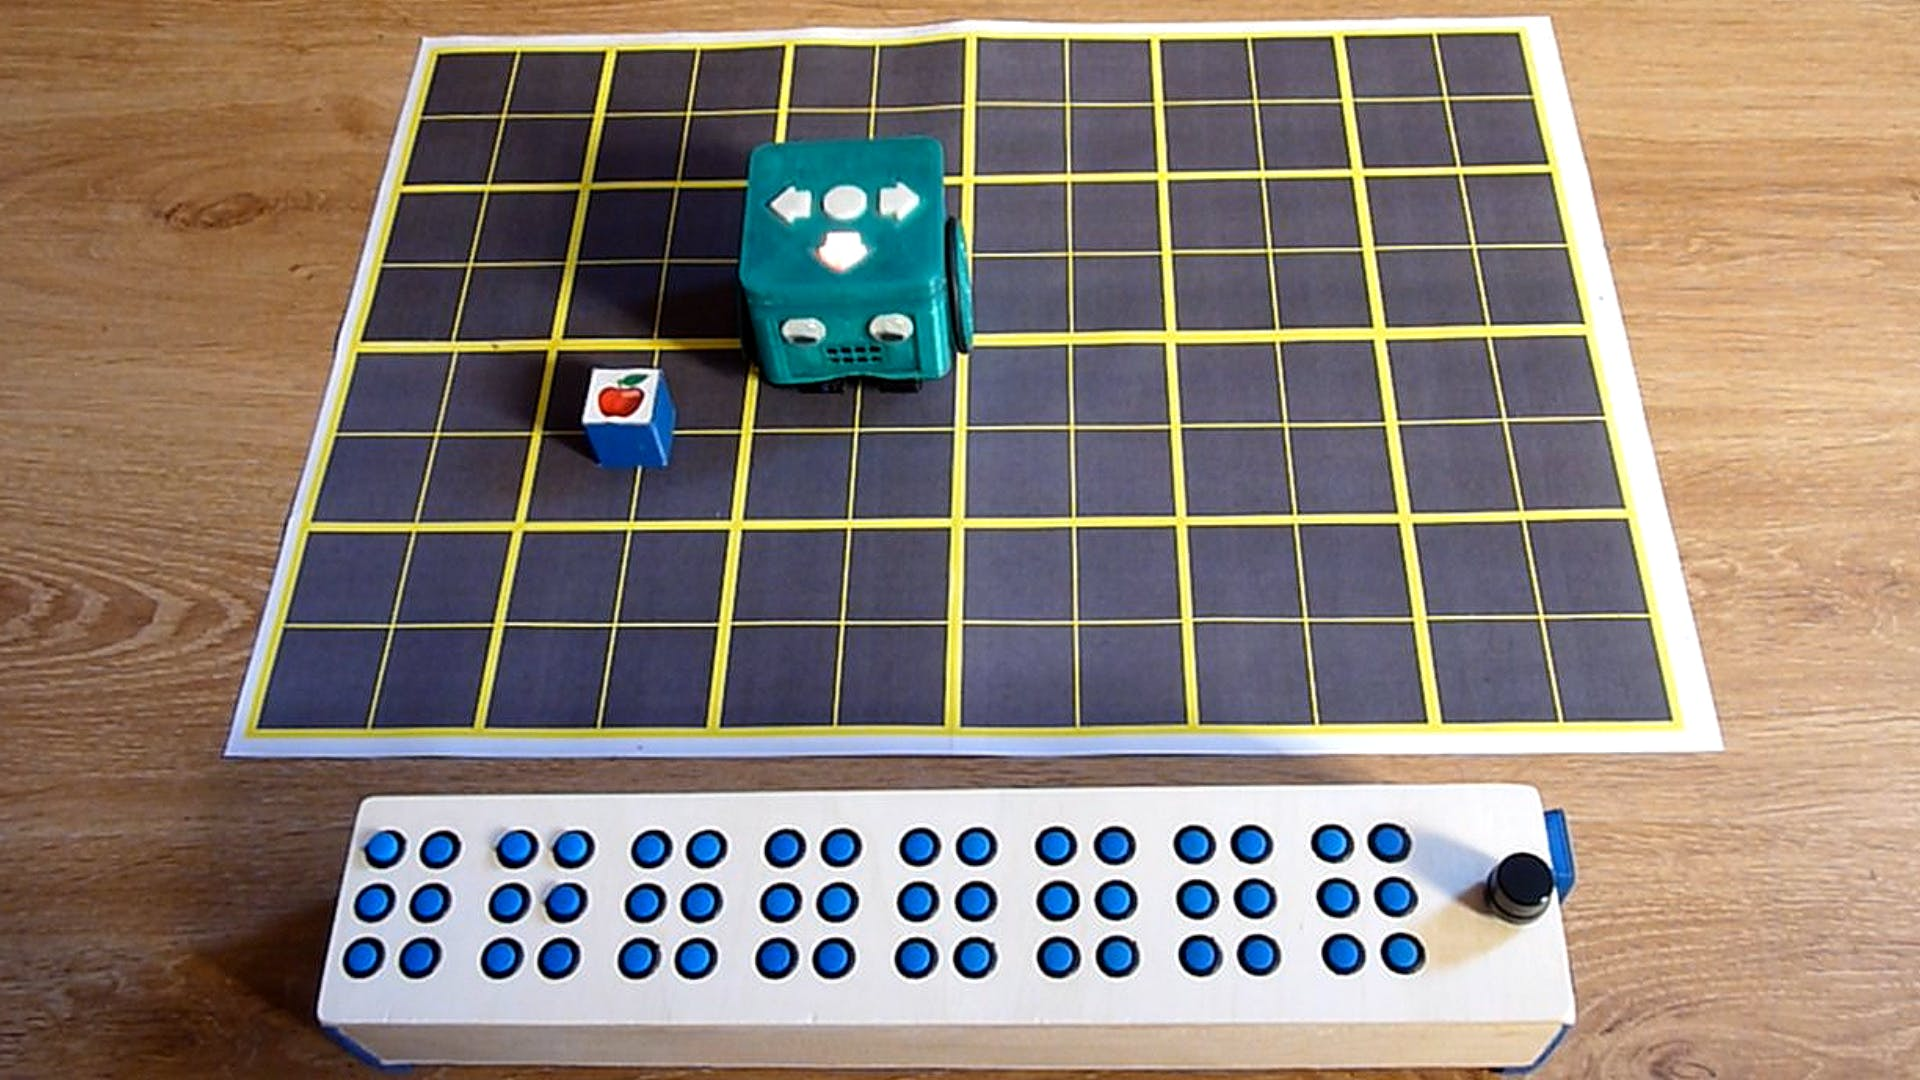 BraiBox (Educational Braille Keyboard & Control Interface)